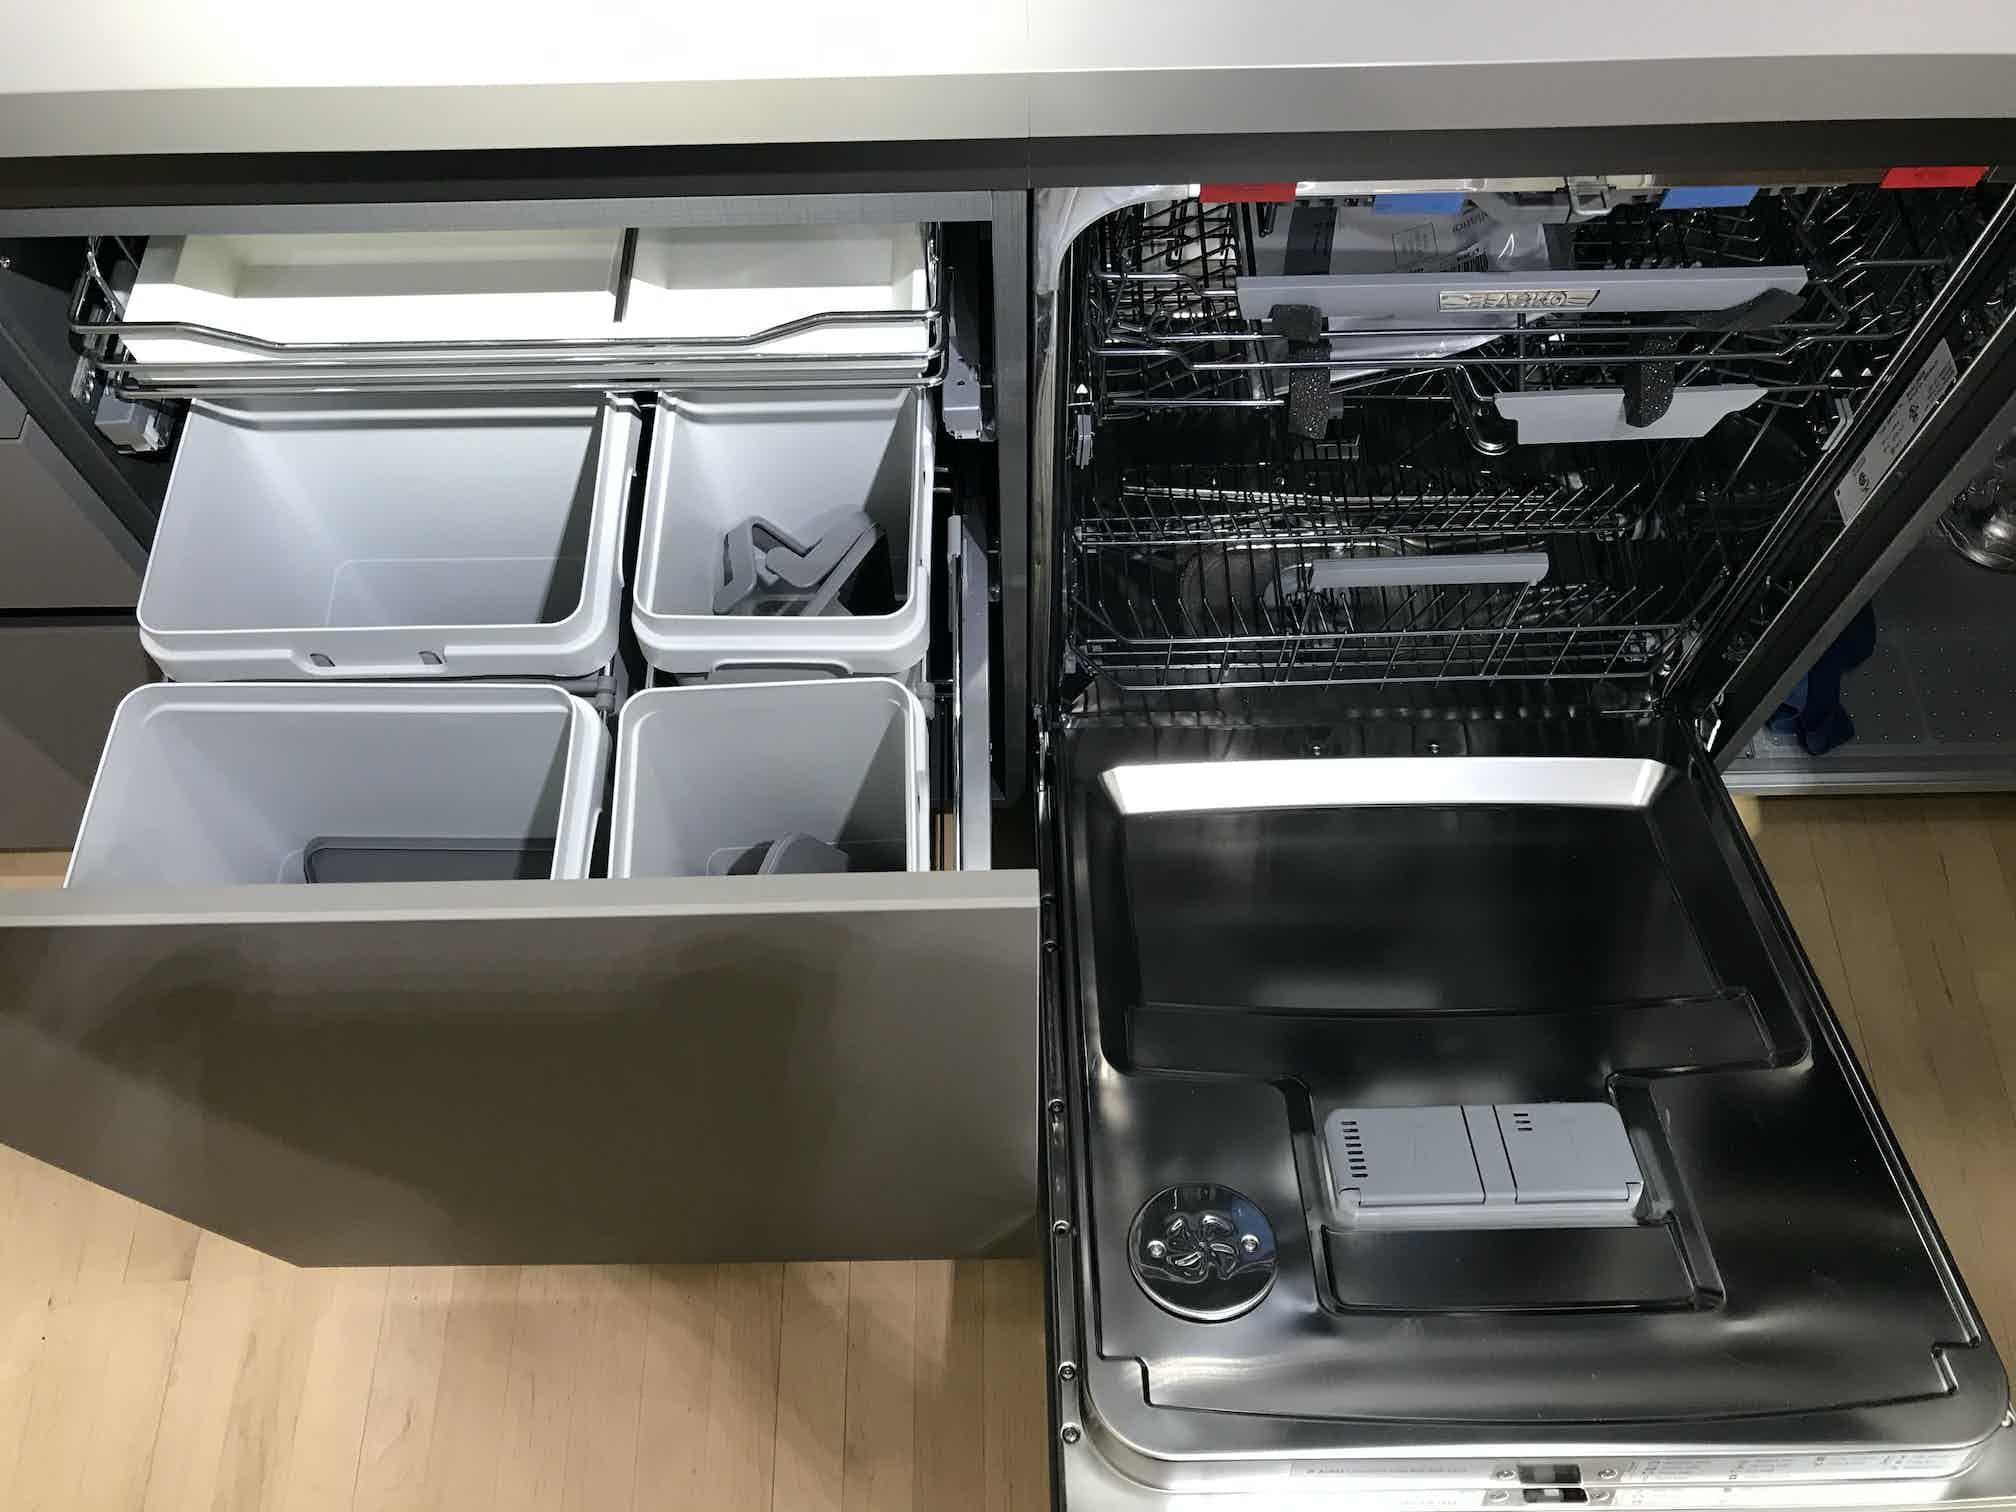 Down dishwasher